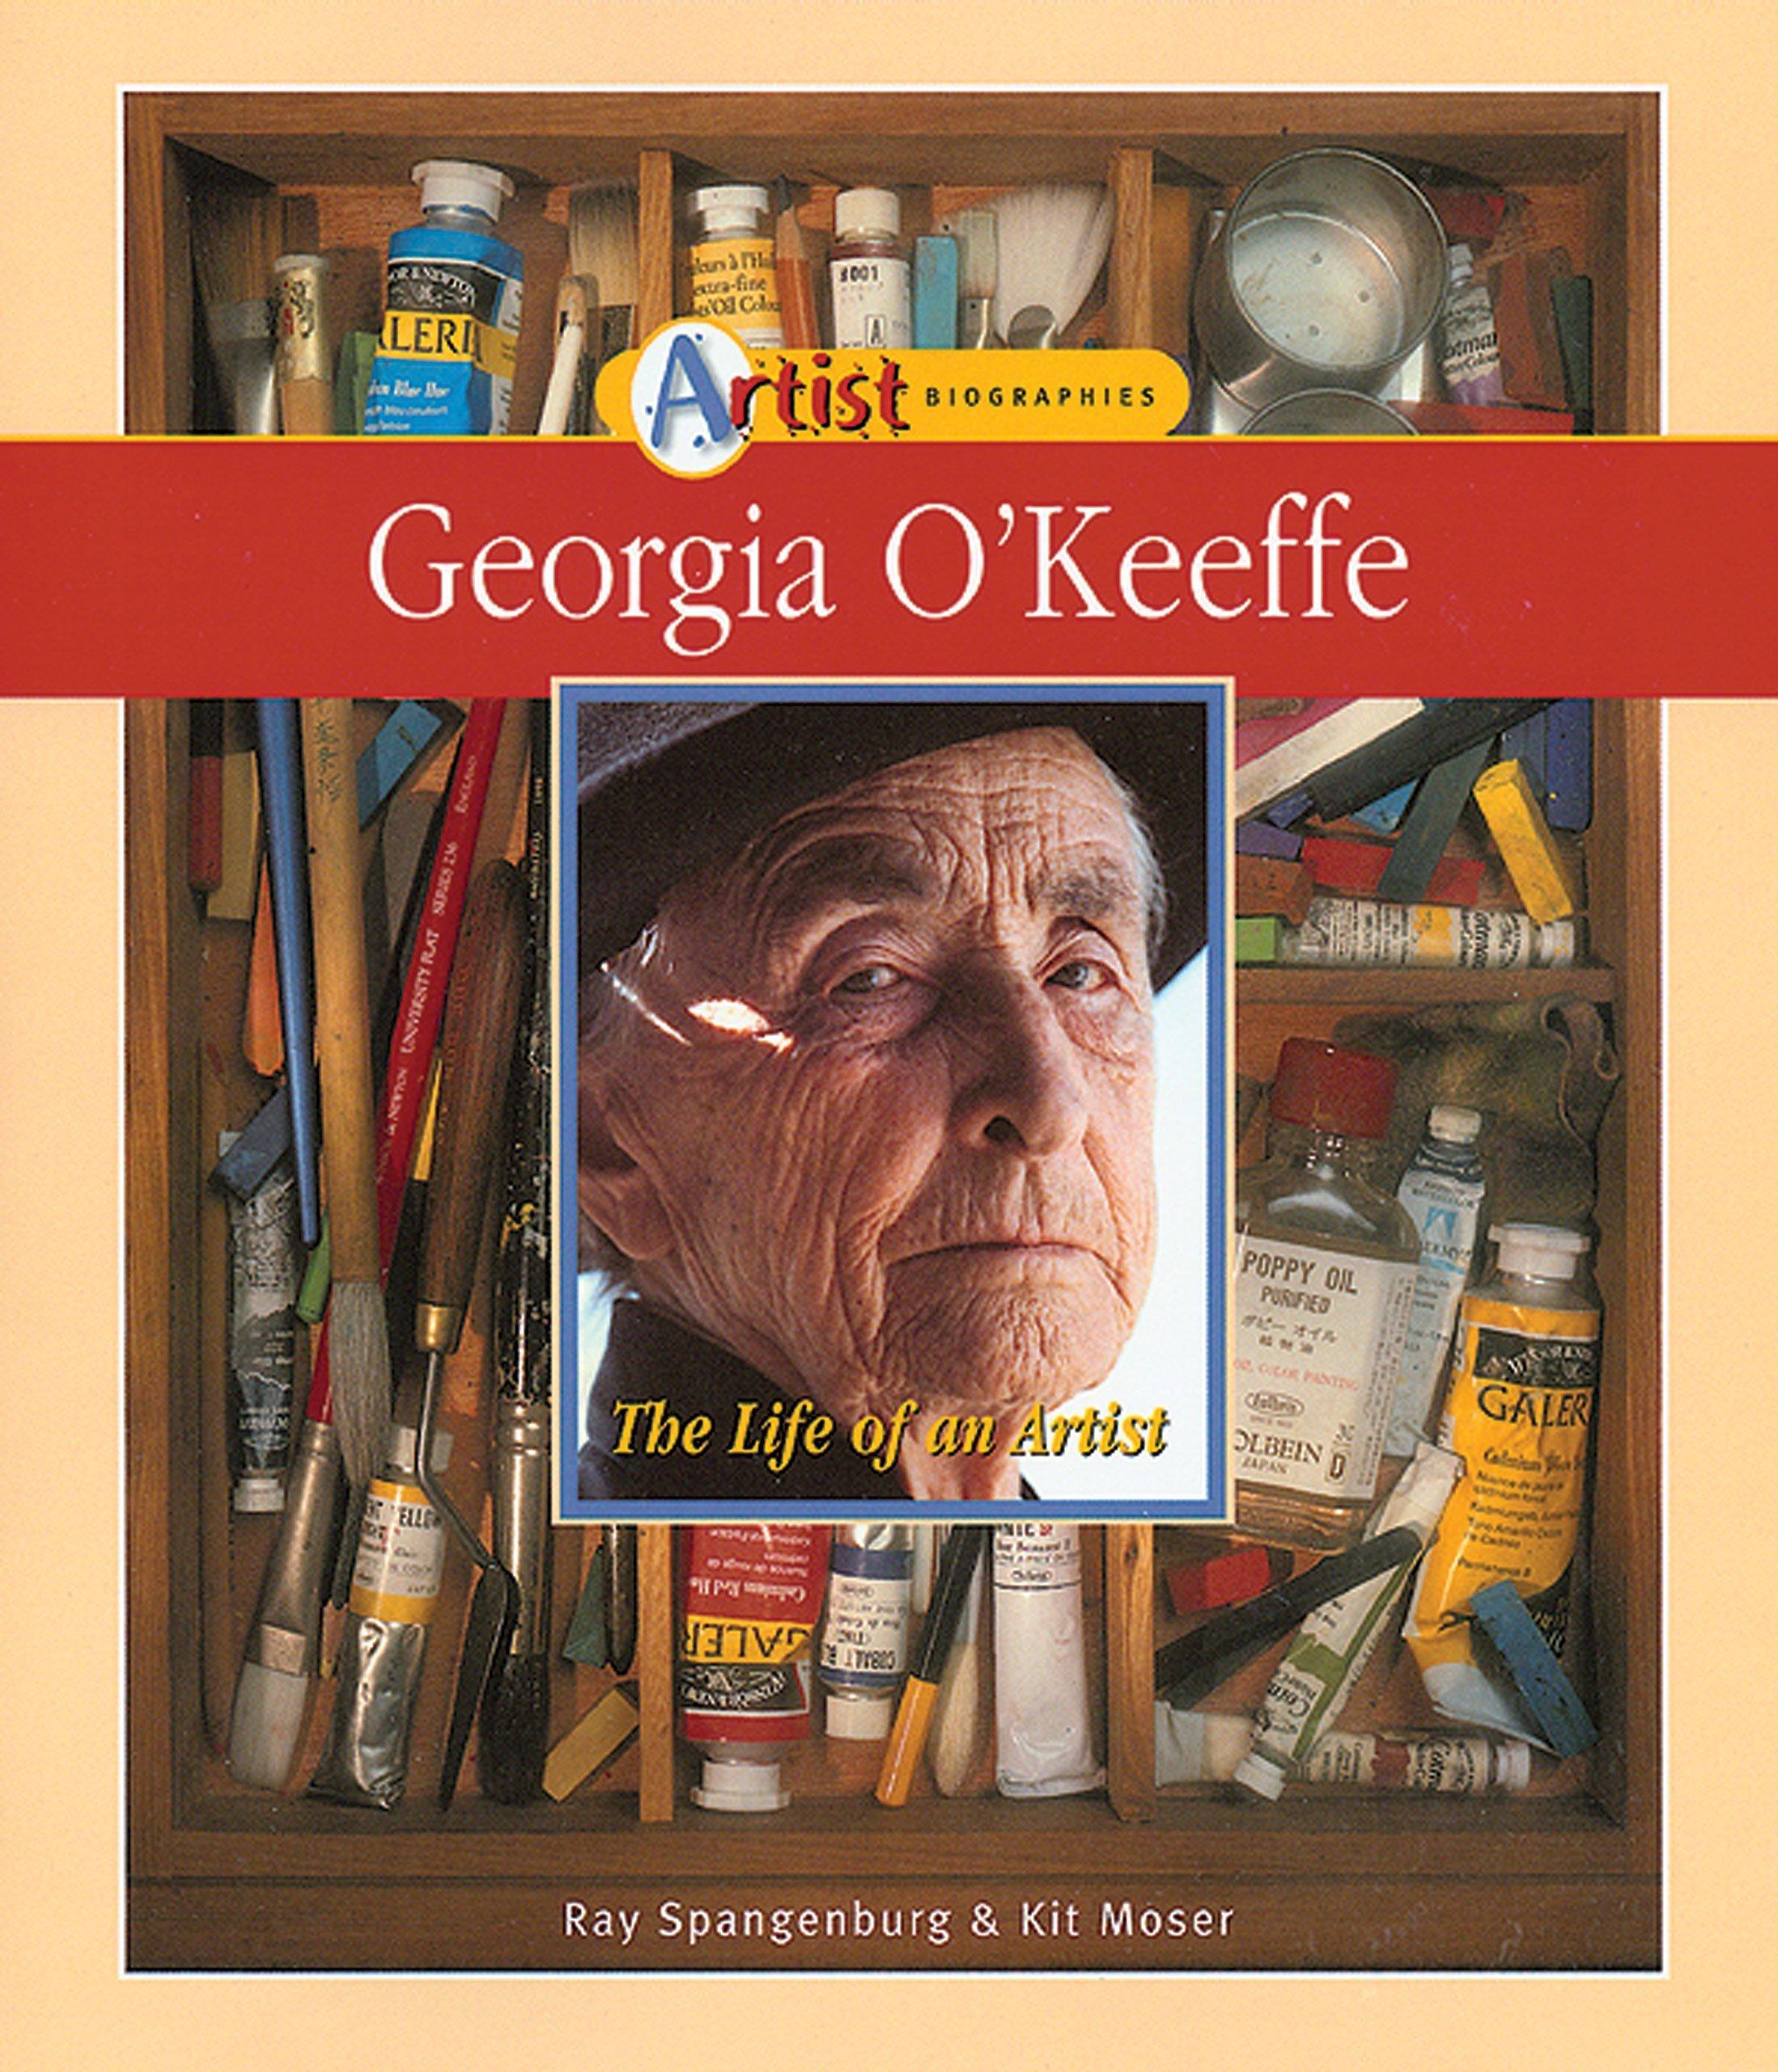 art ed books and kits georgia okeeffe art ed books kits